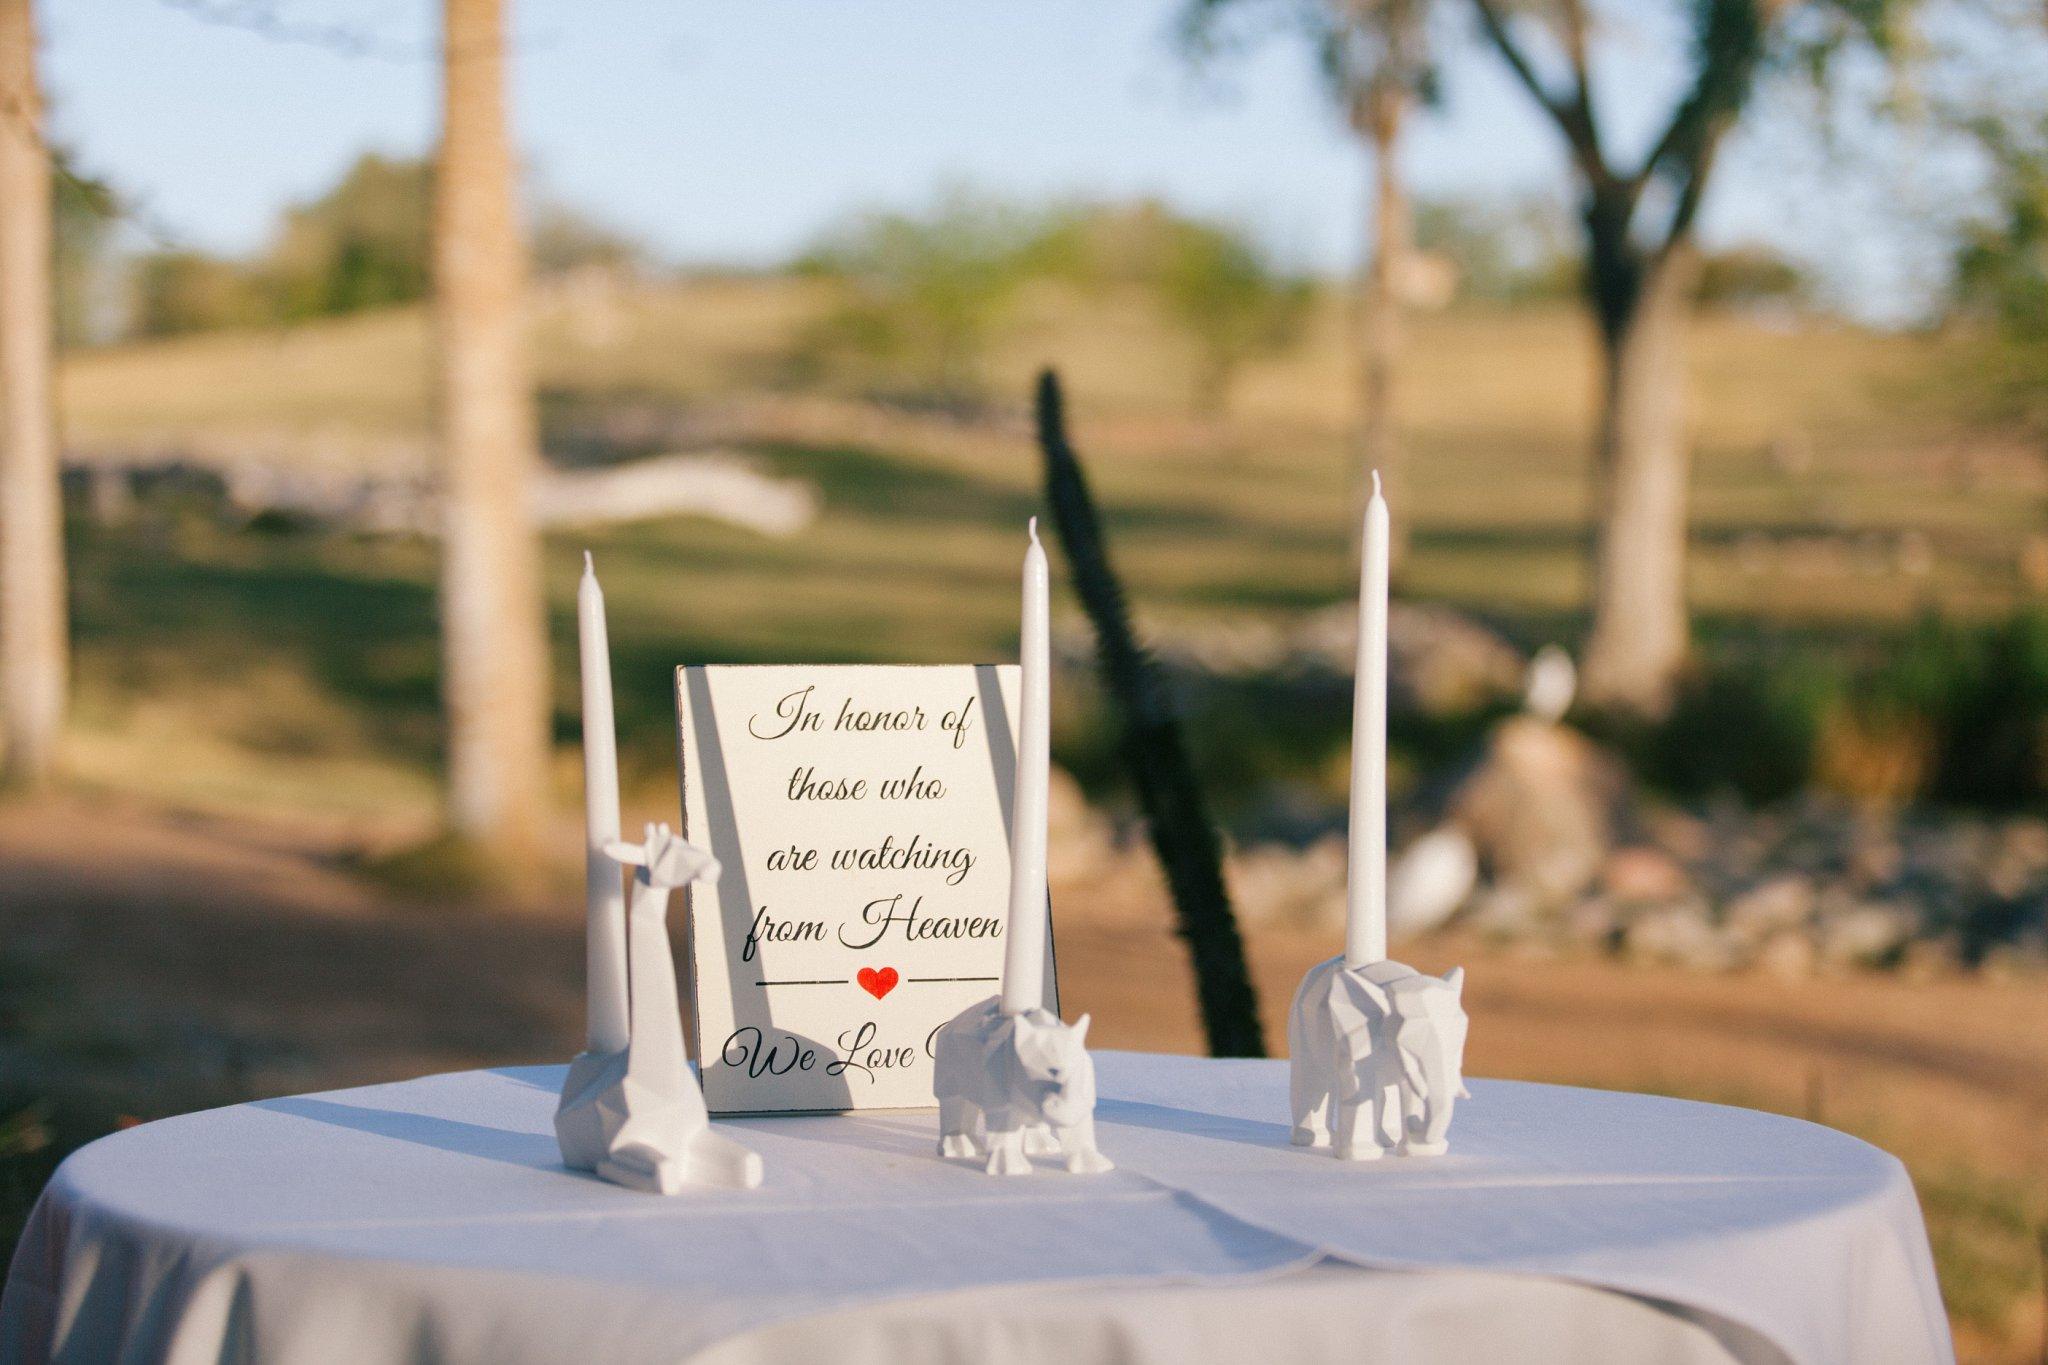 Phoenix zoo wedding rememberance candles